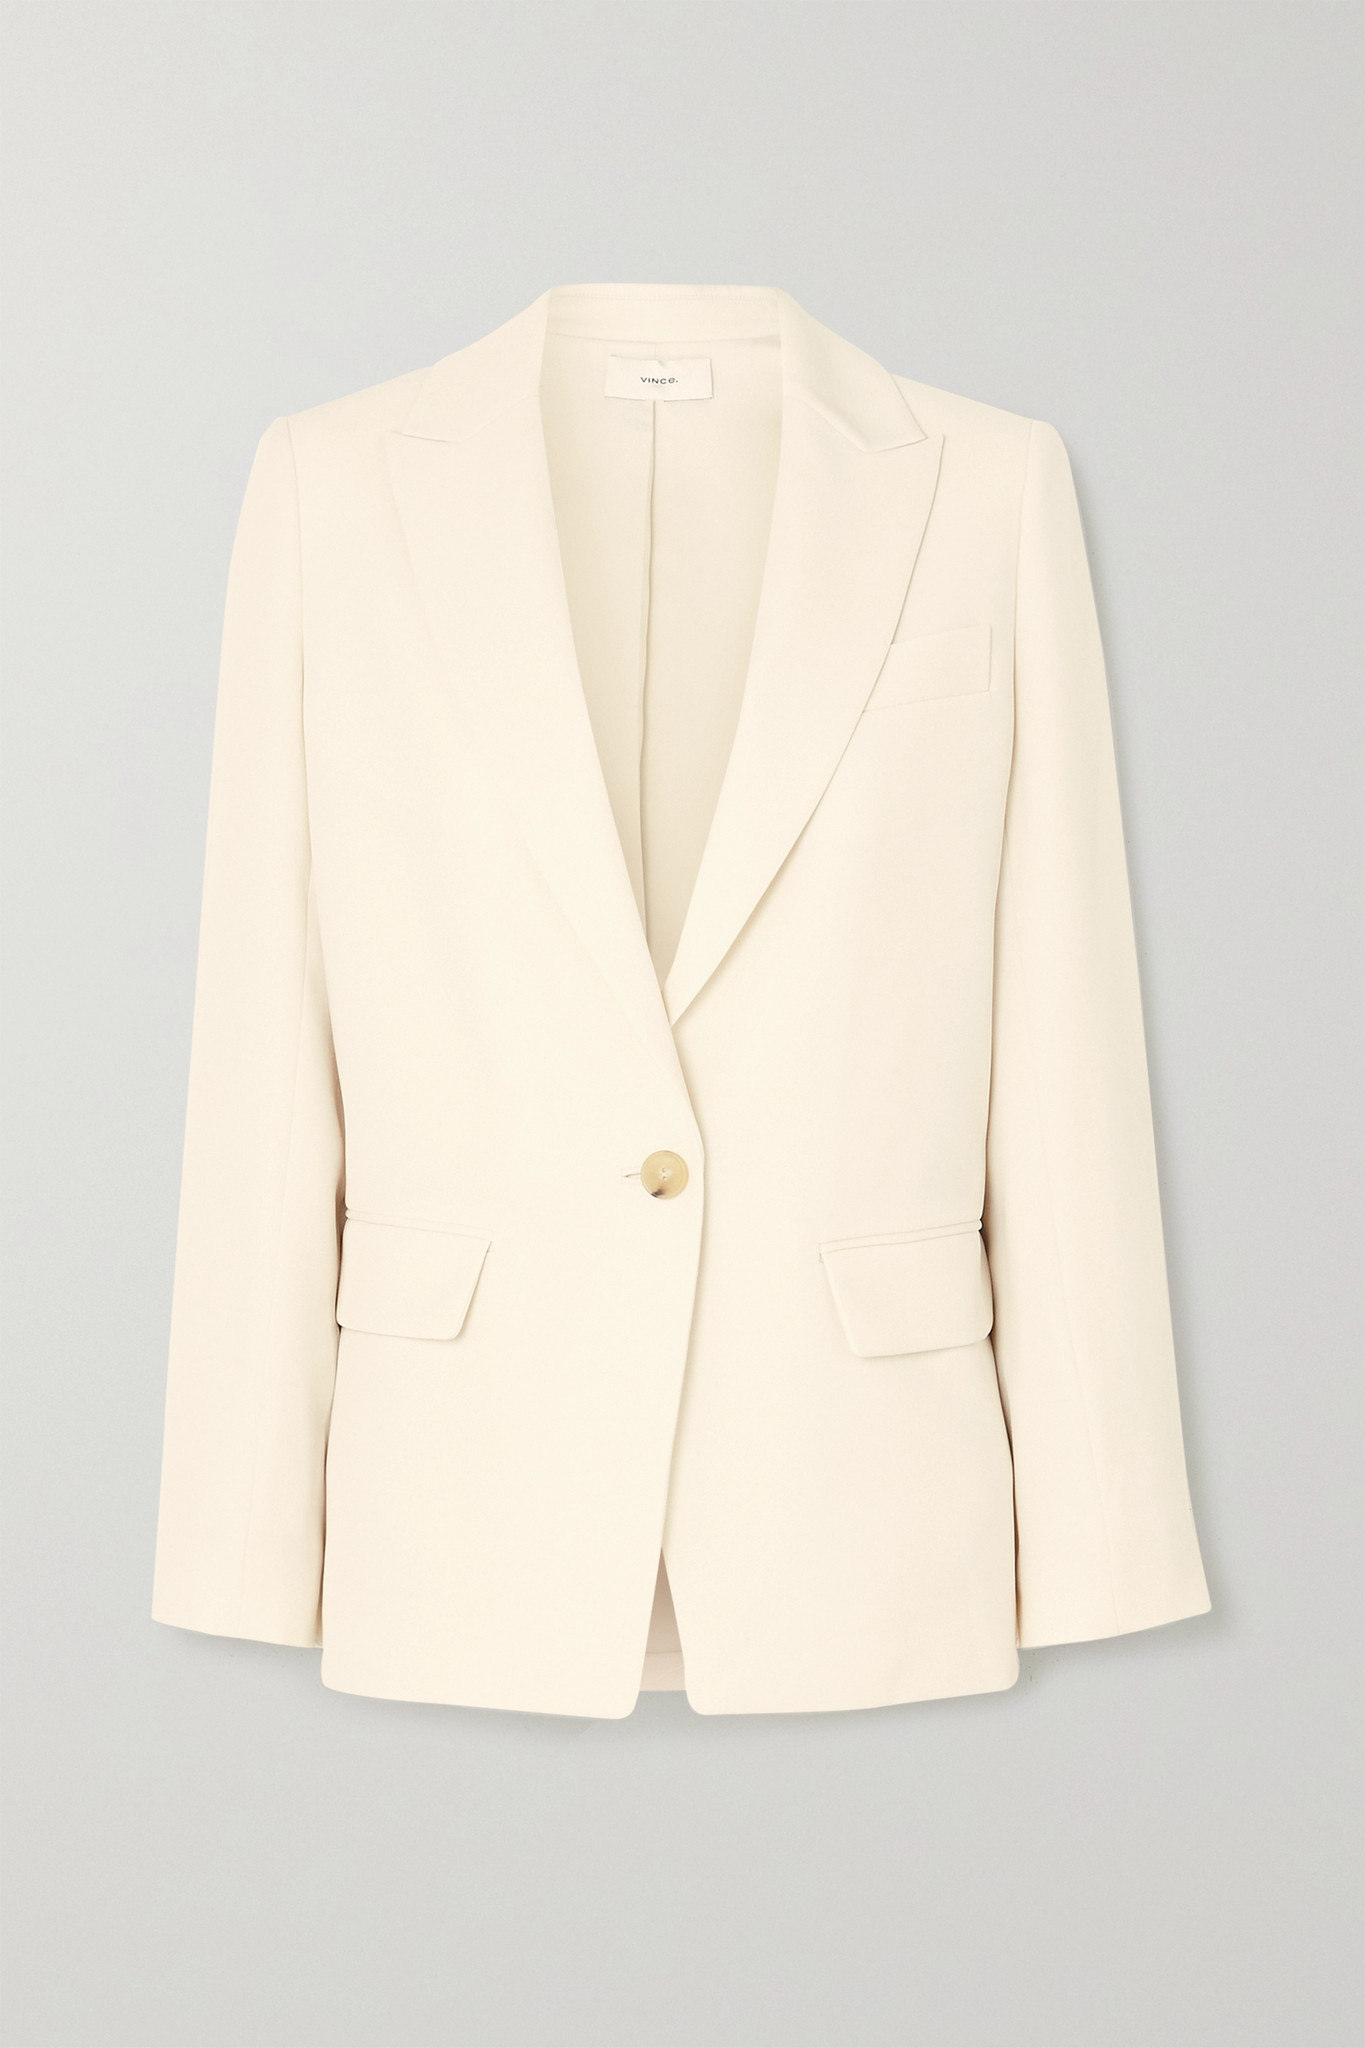 VINCE - Boyfriend 梭织西装外套 - 米白色 - US4